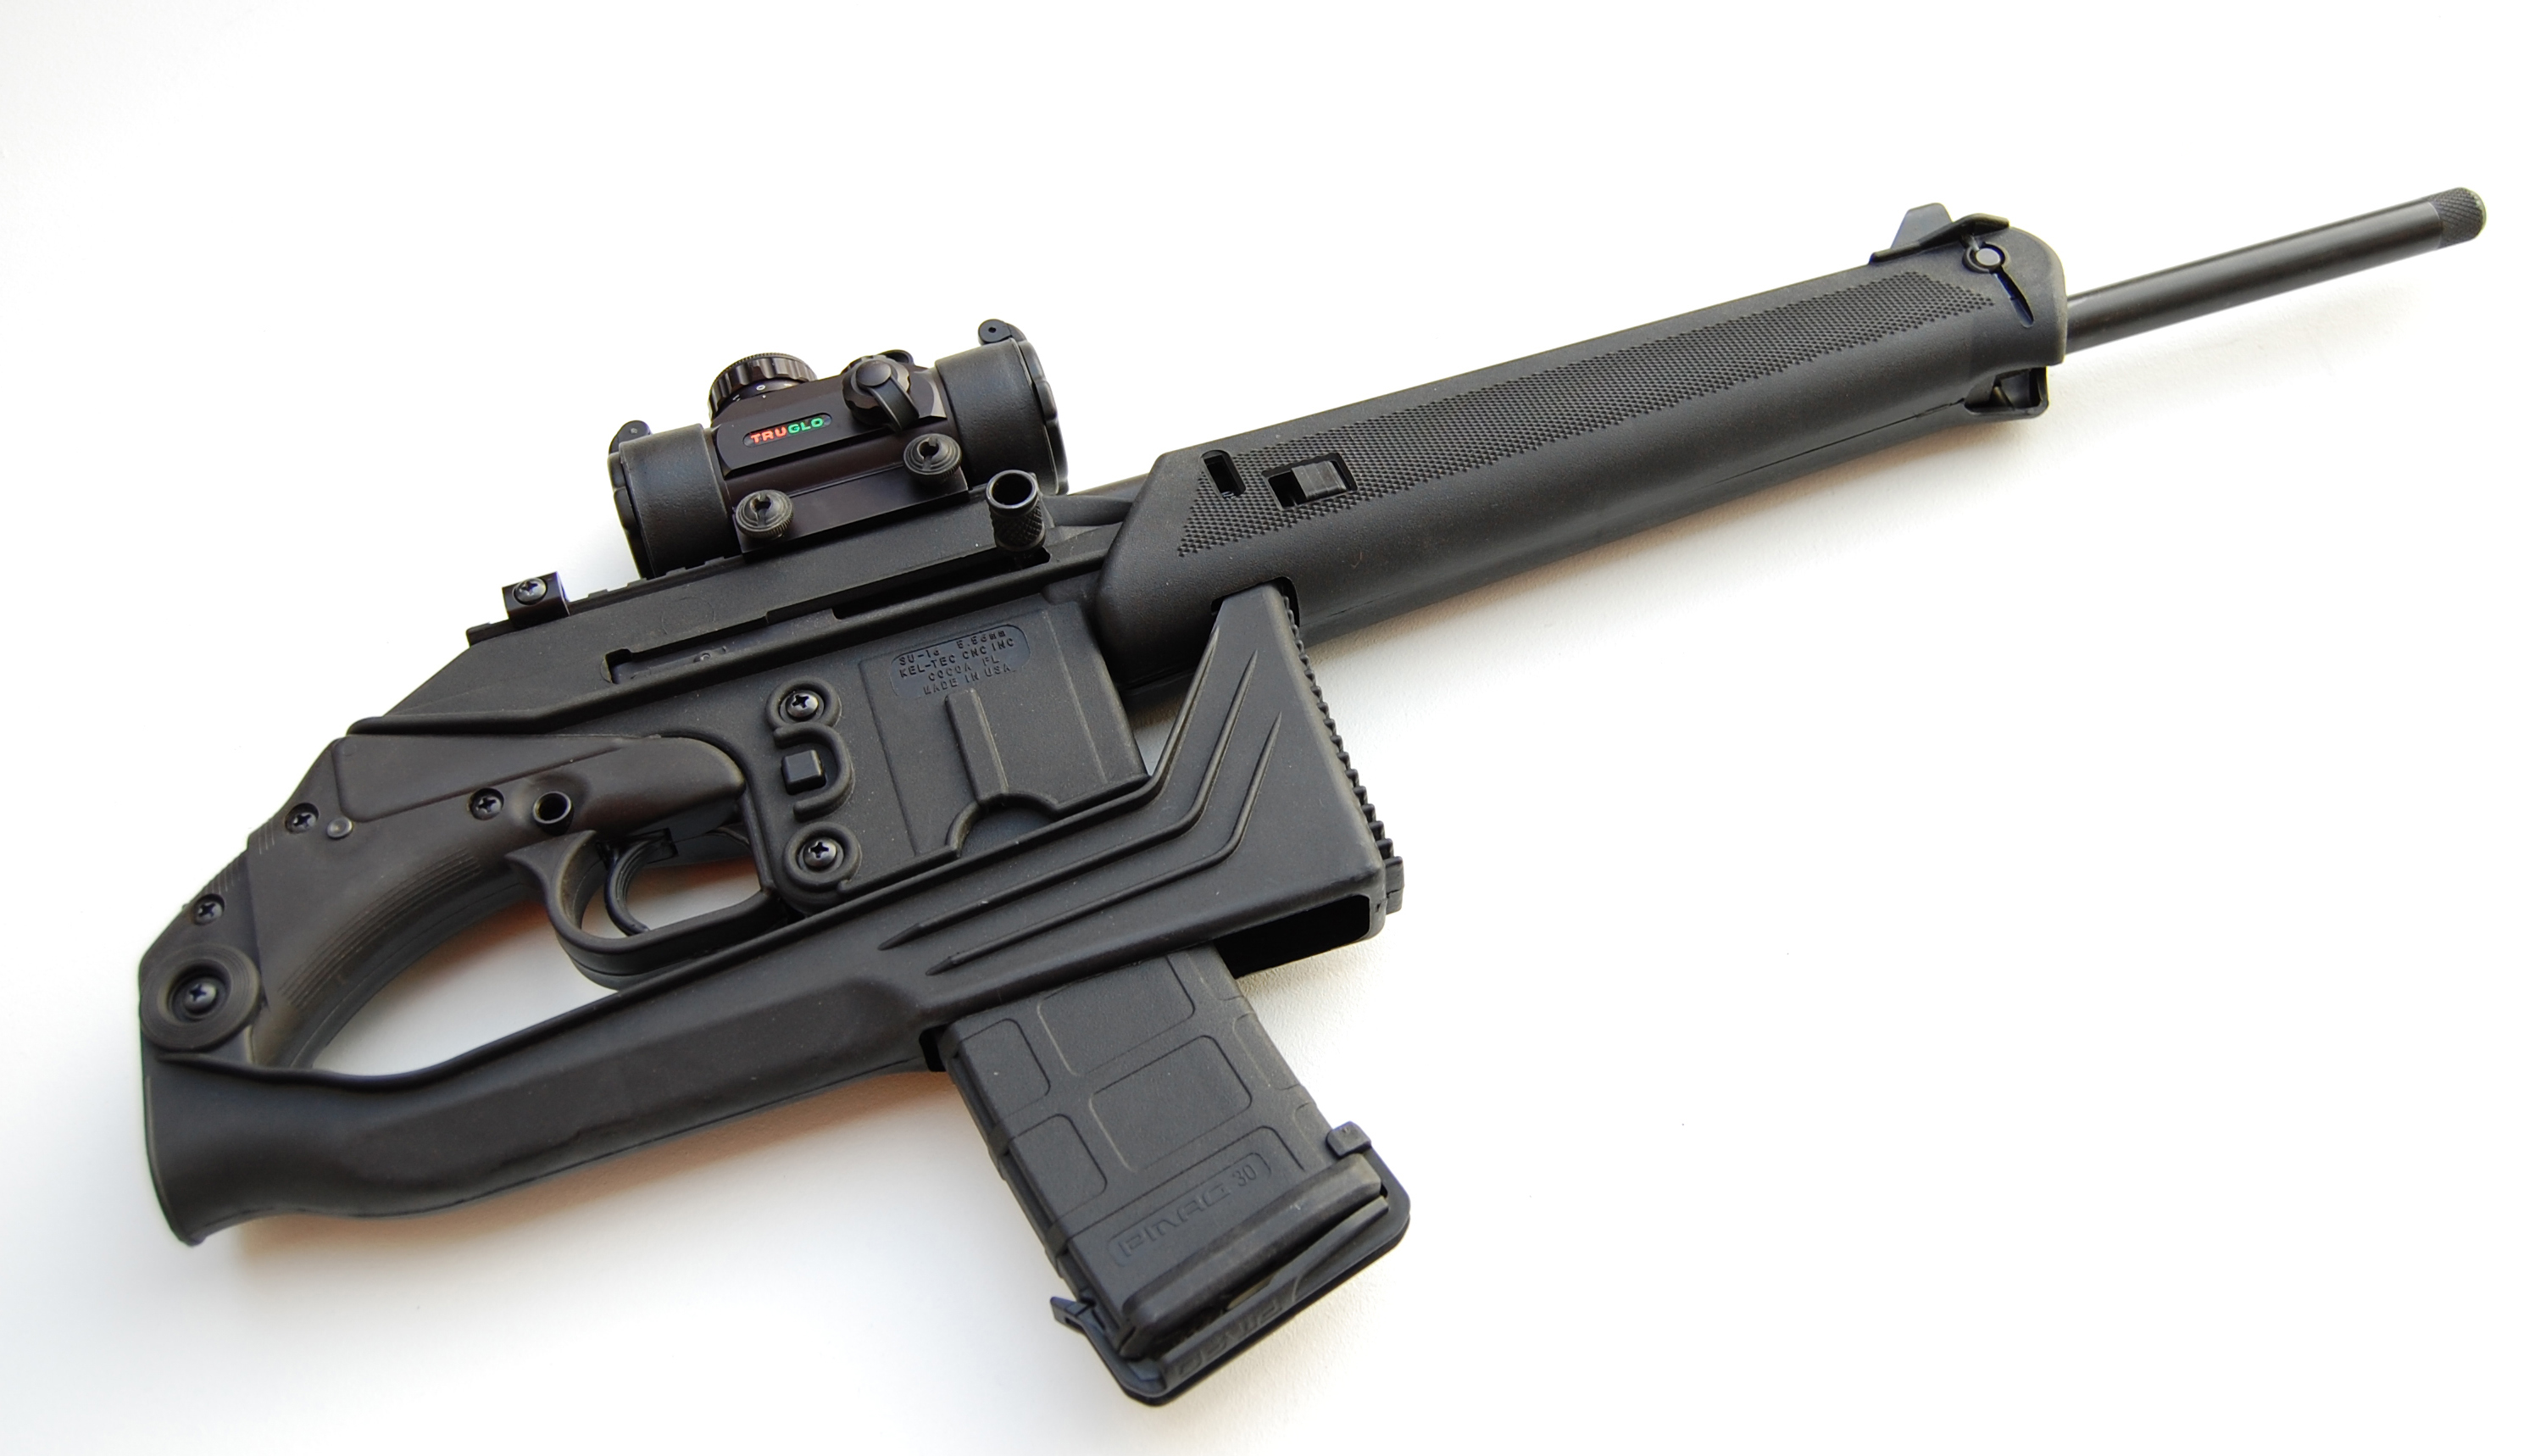 Review: Kel-Tec SU-1C6 Rifle - OutdoorHub